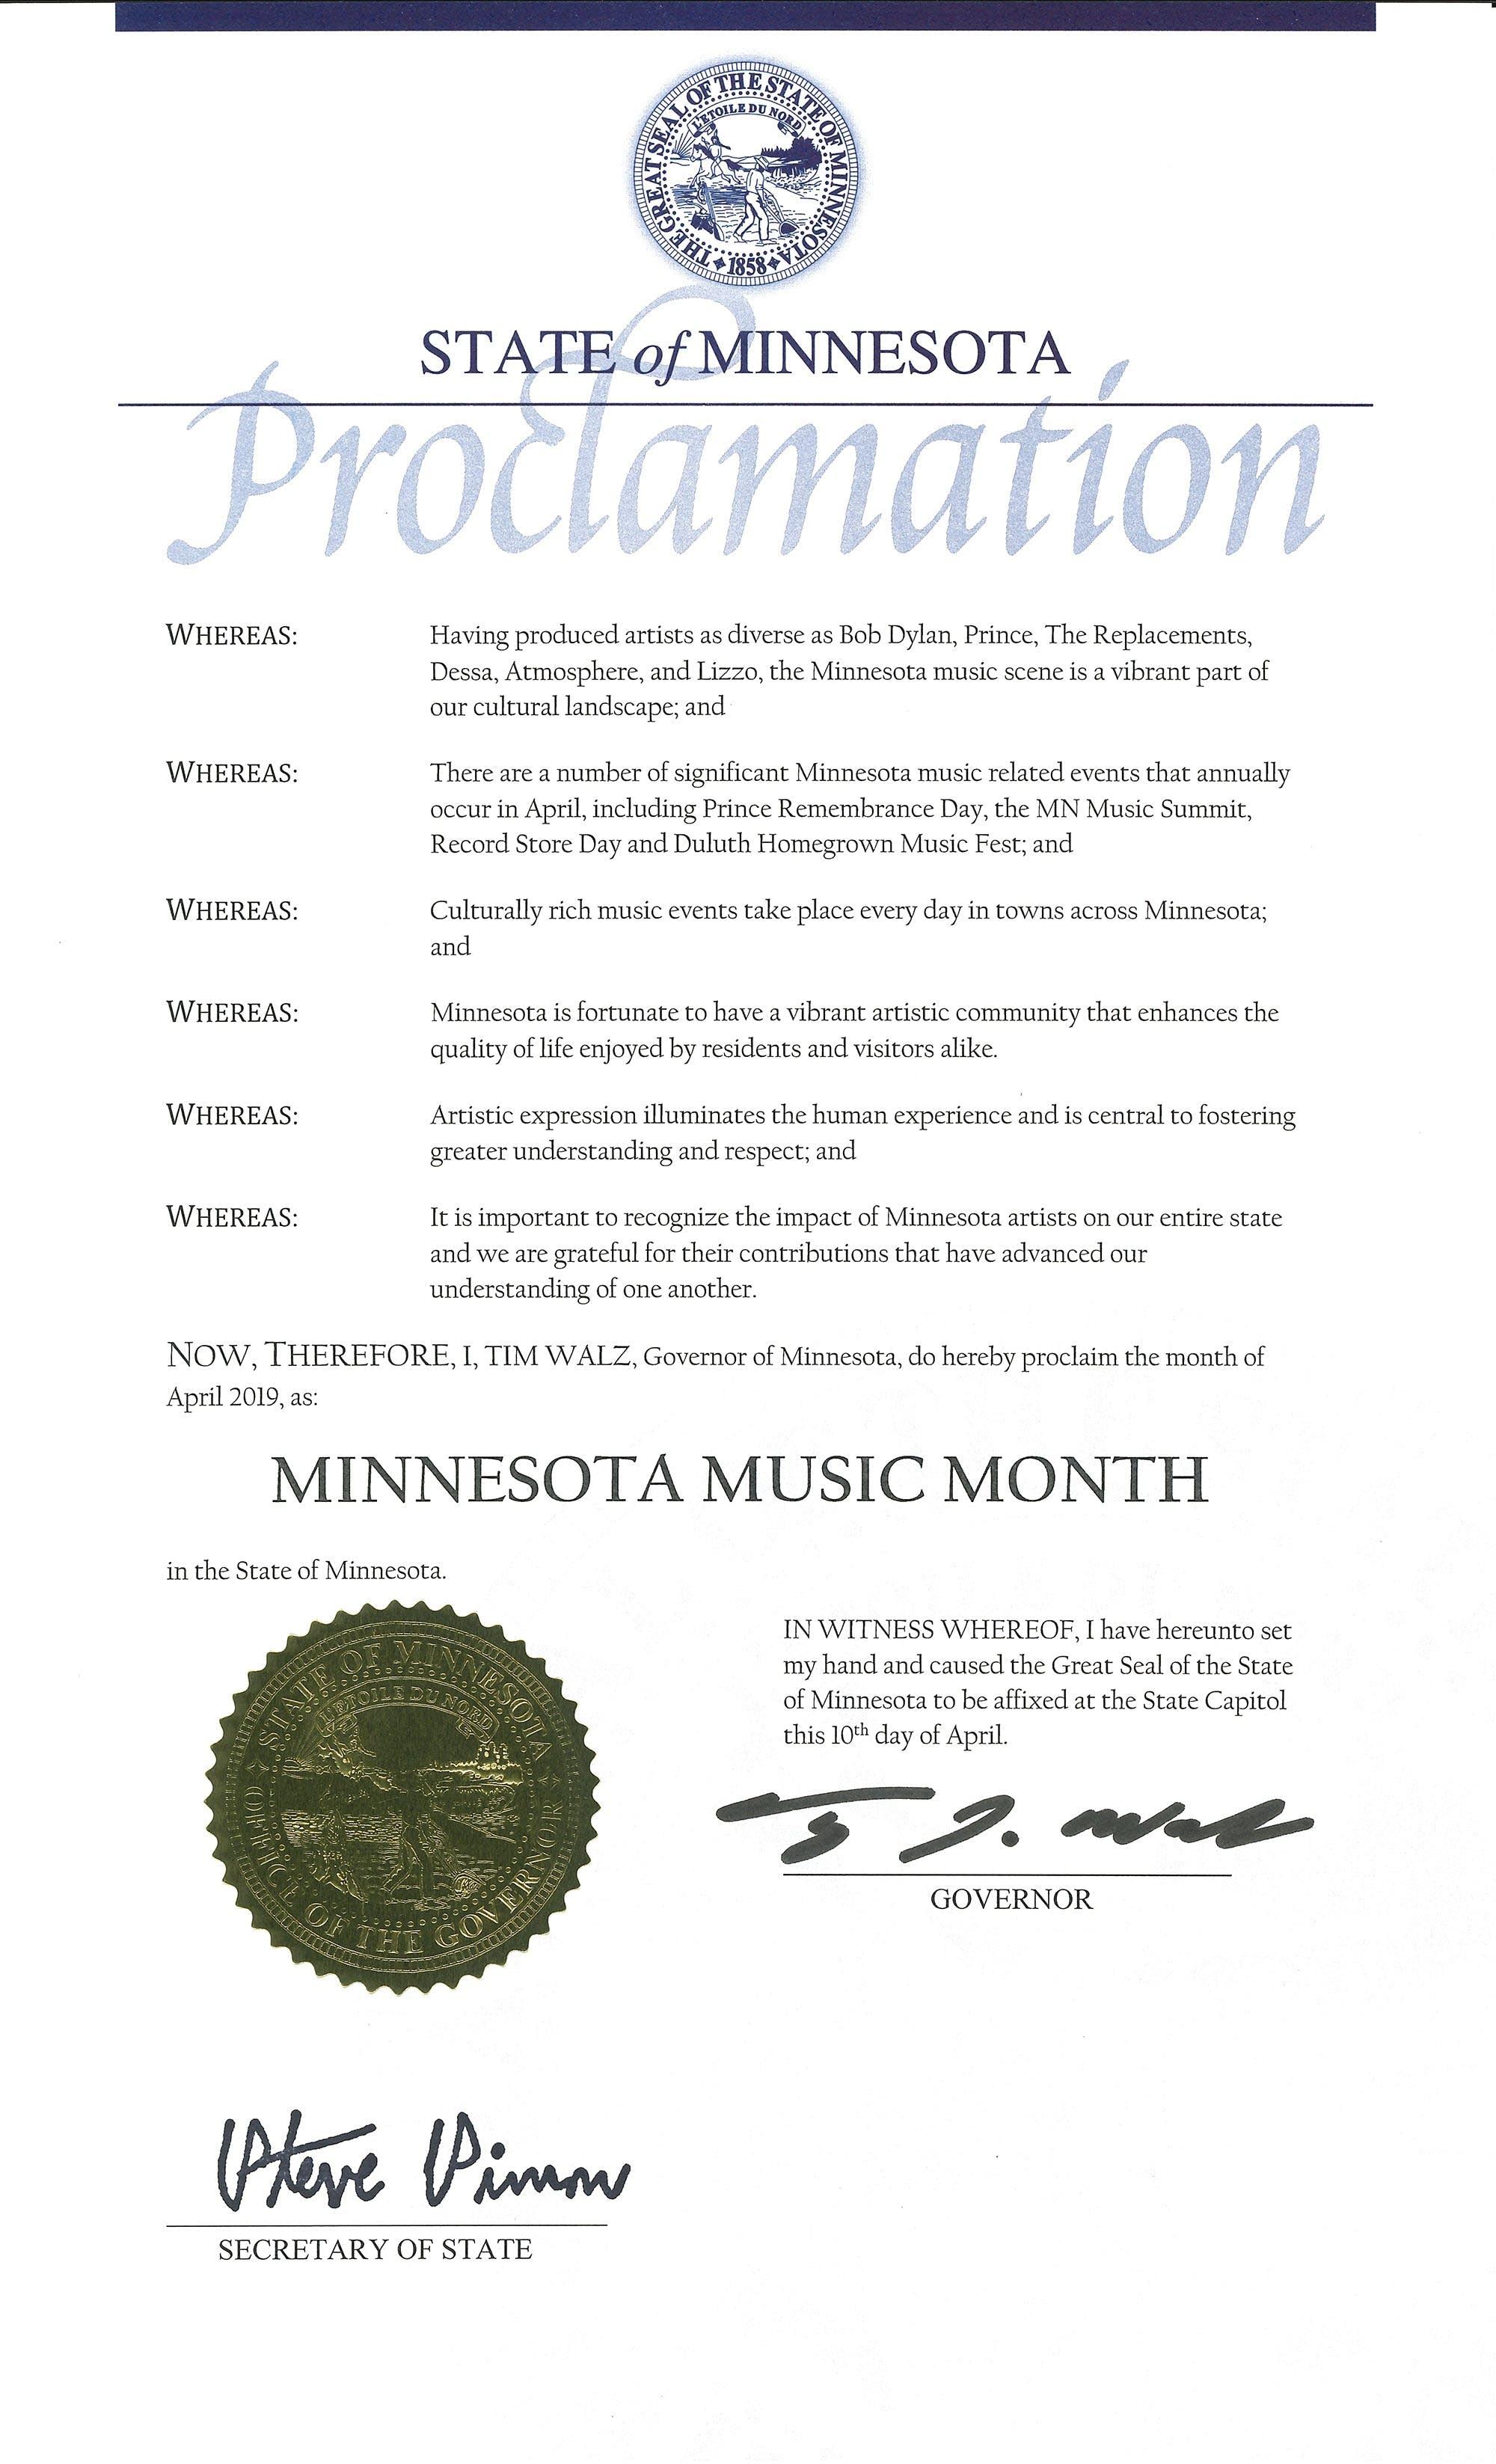 Minnesota Music Month